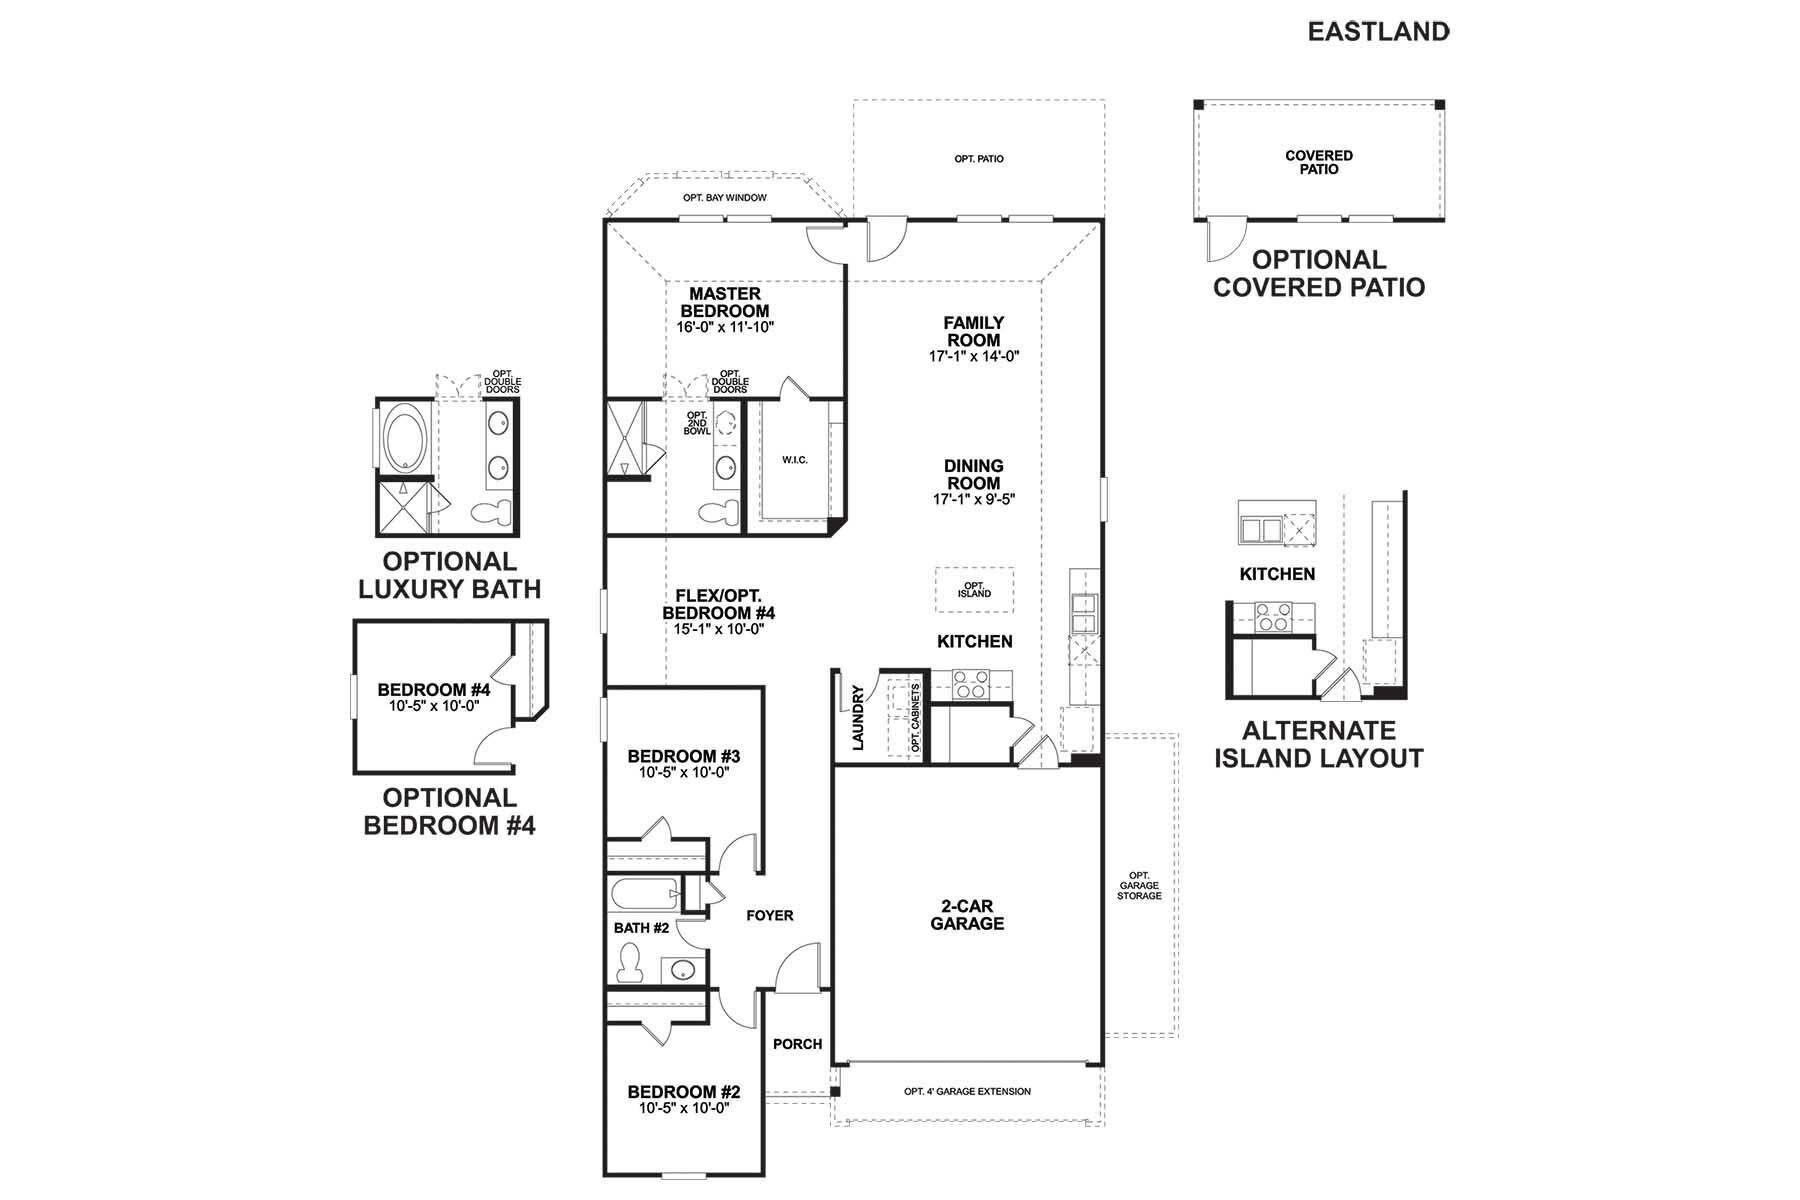 Eastland First Floor